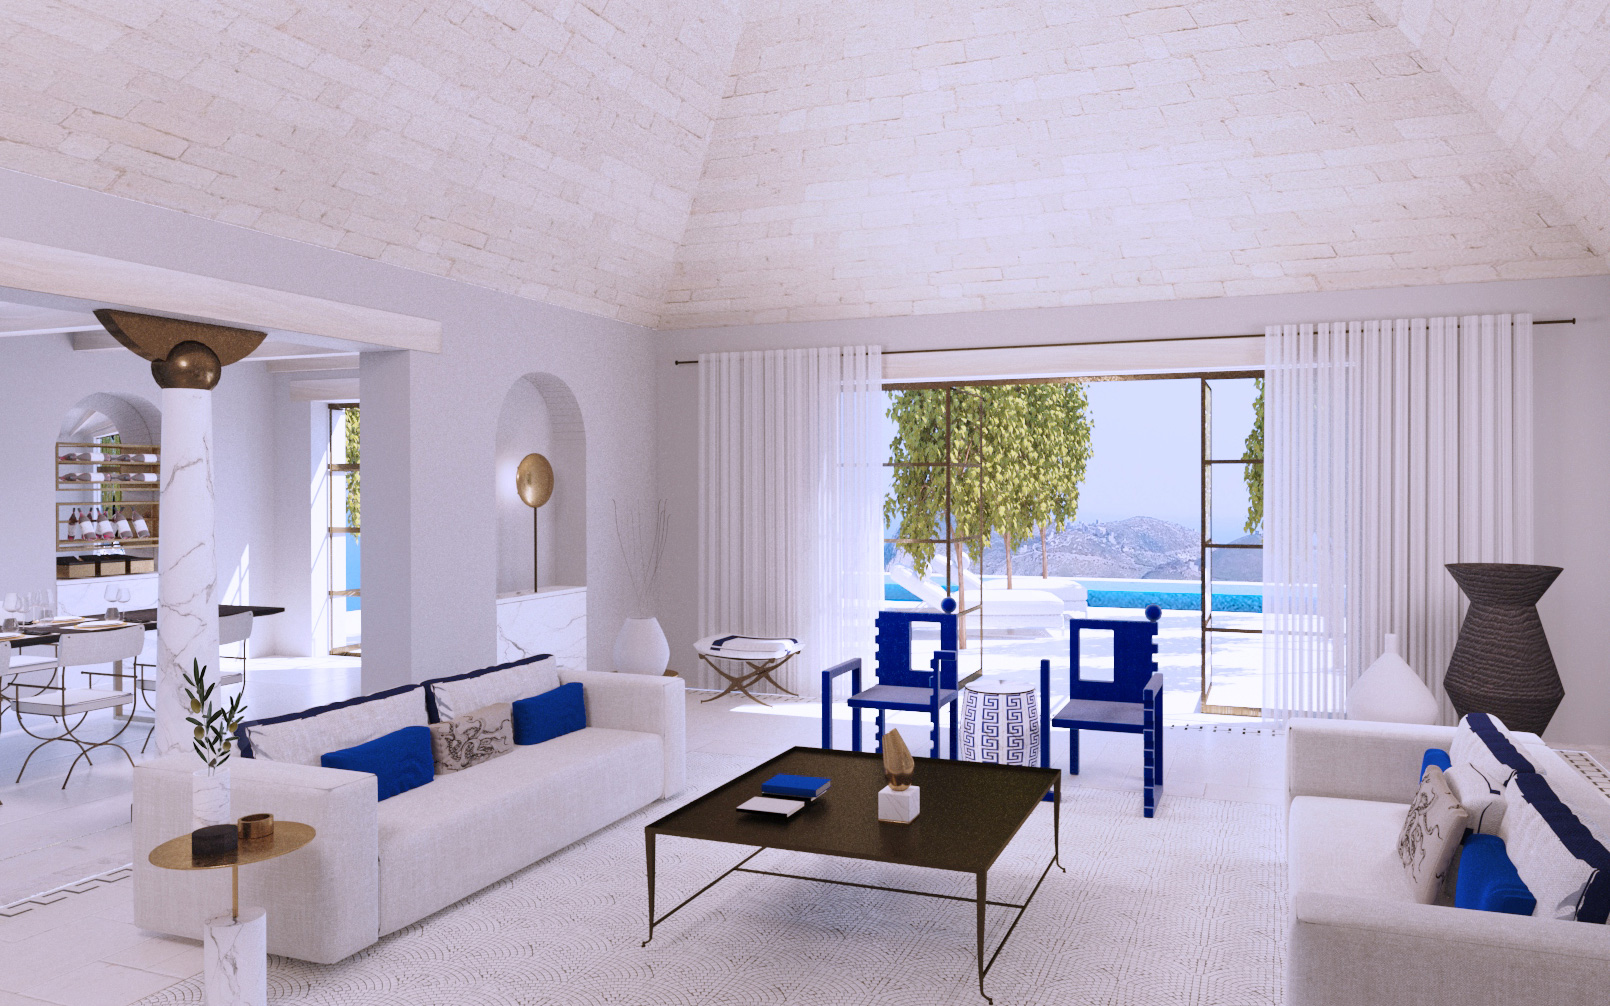 villa mani - speculative design lounge, terrace and swimming pool